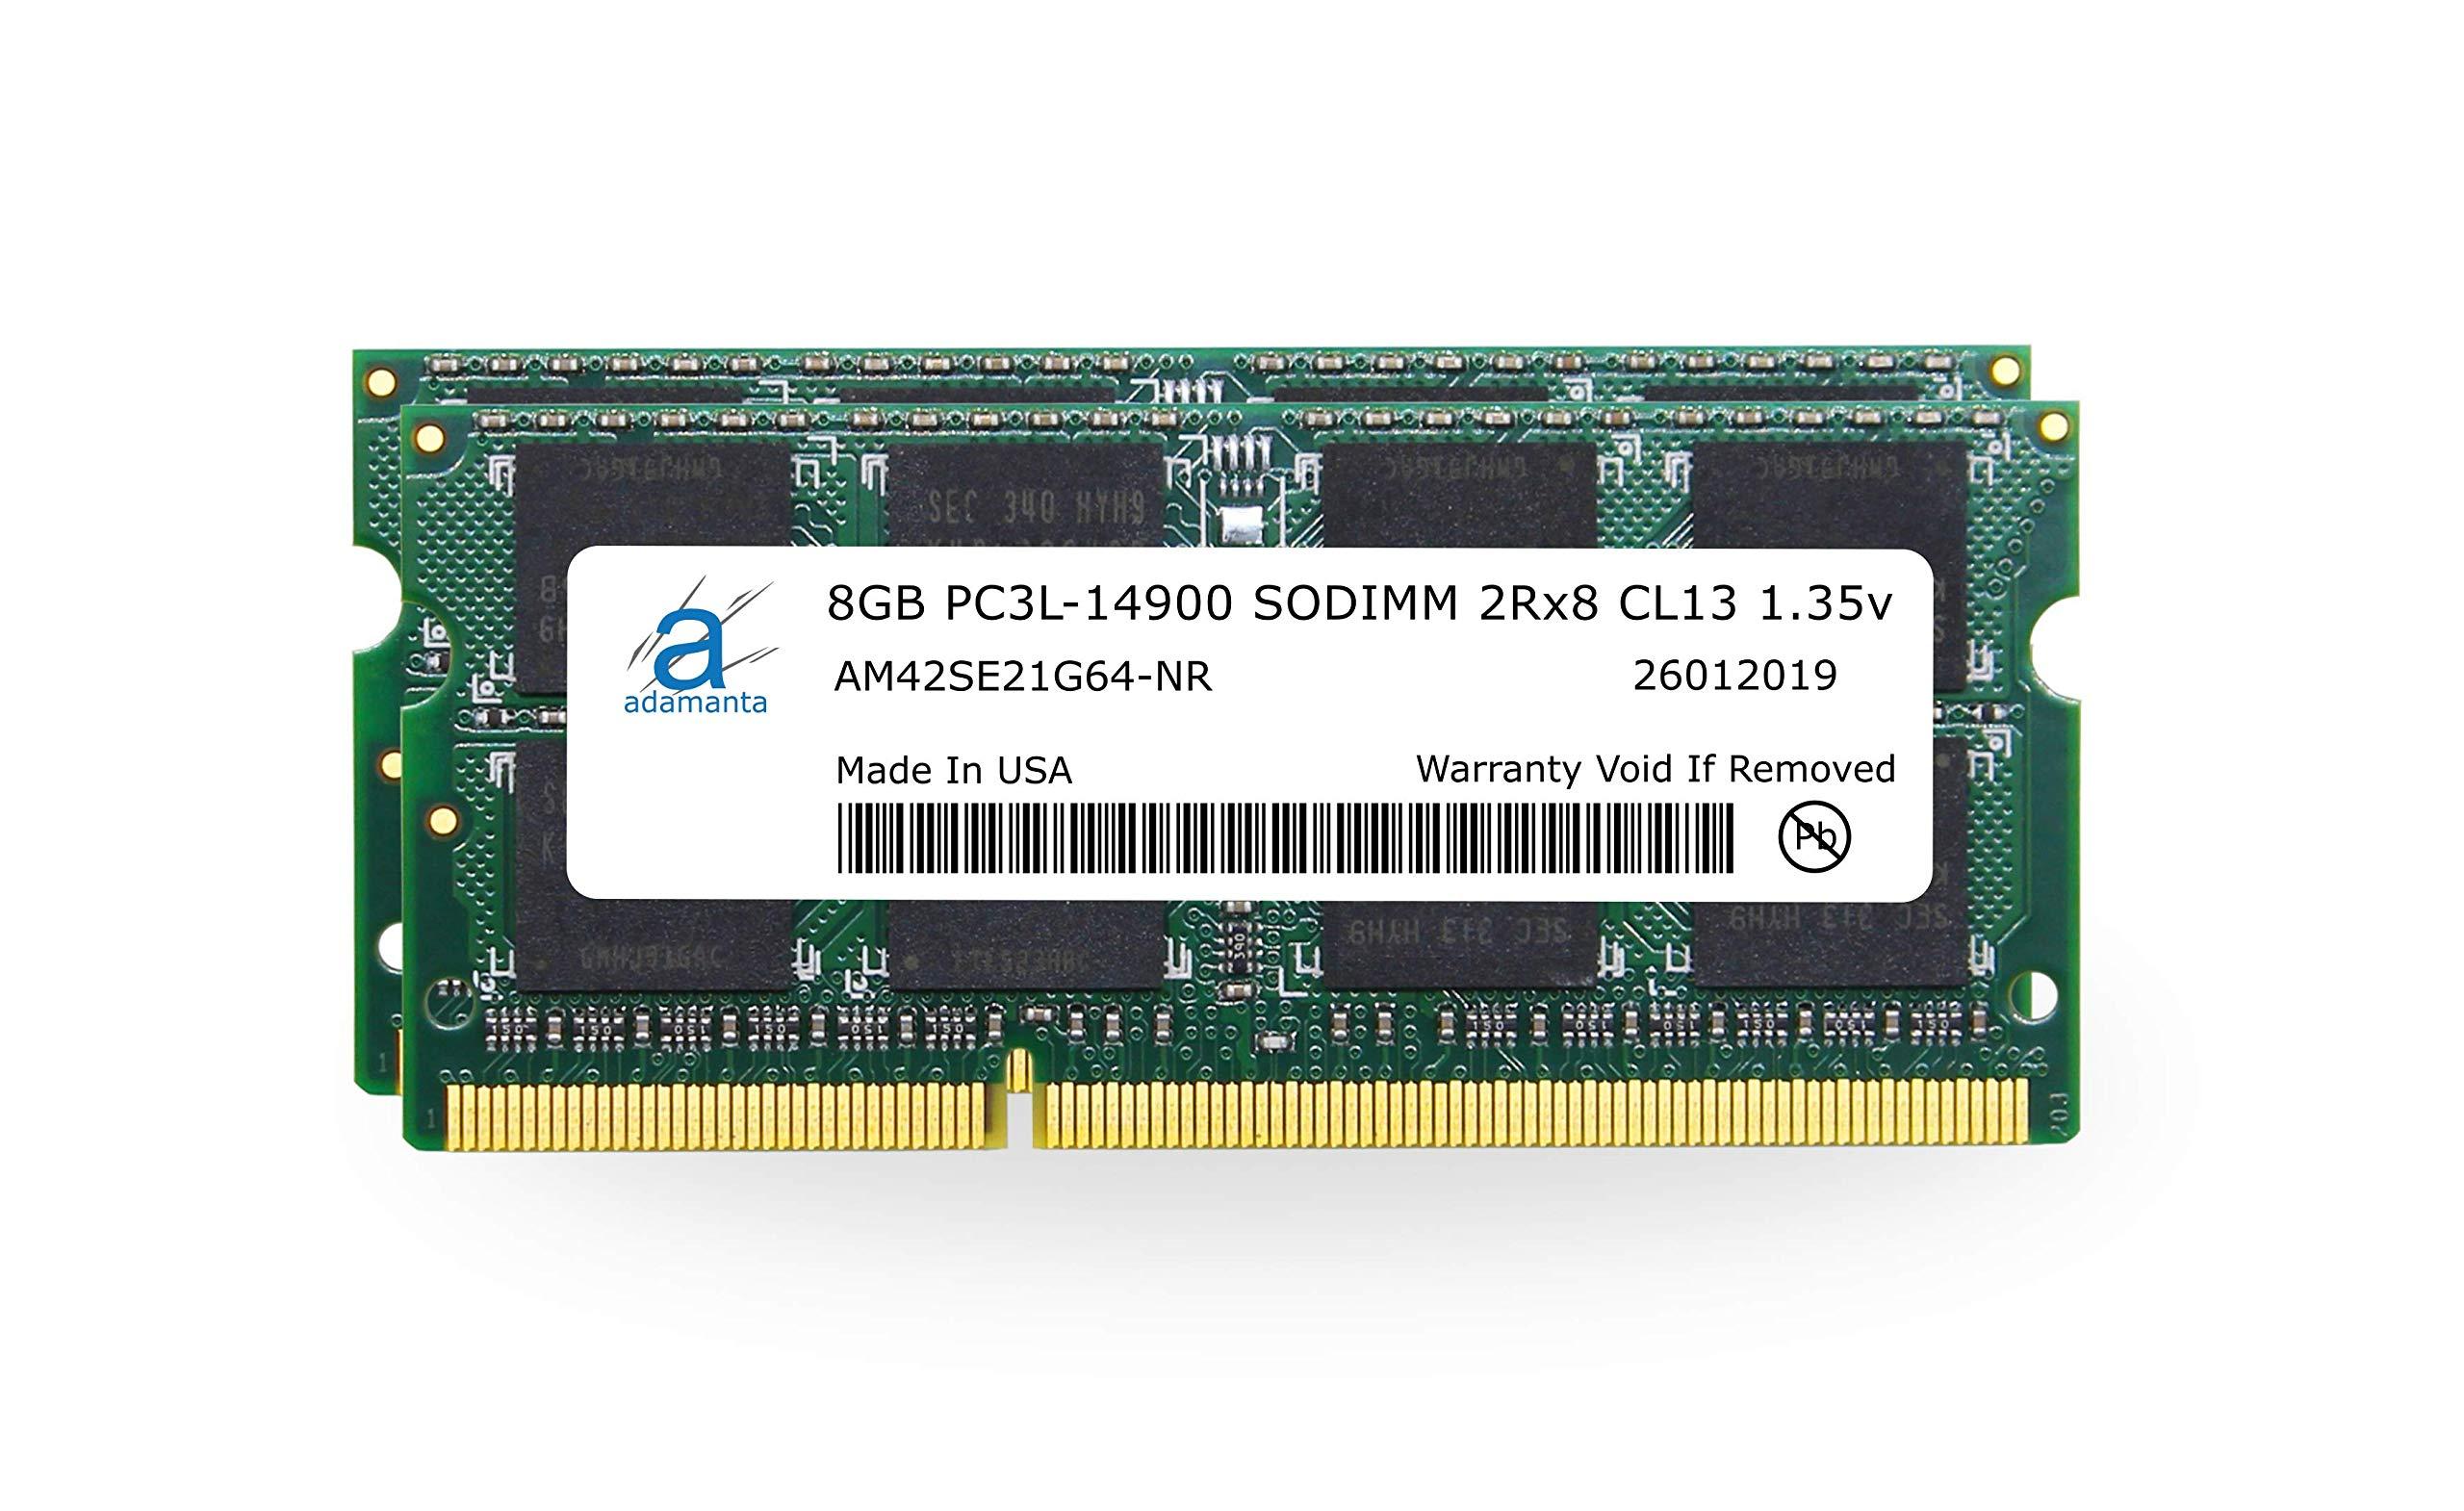 Adamanta 16GB (2x8GB) Apple Memory Upgrade for Late 2015 iMac 27'' DDR3/DDR3L 1867Mhz PC3L-14900 SODIMM 2Rx8 CL13 1.35v RAM